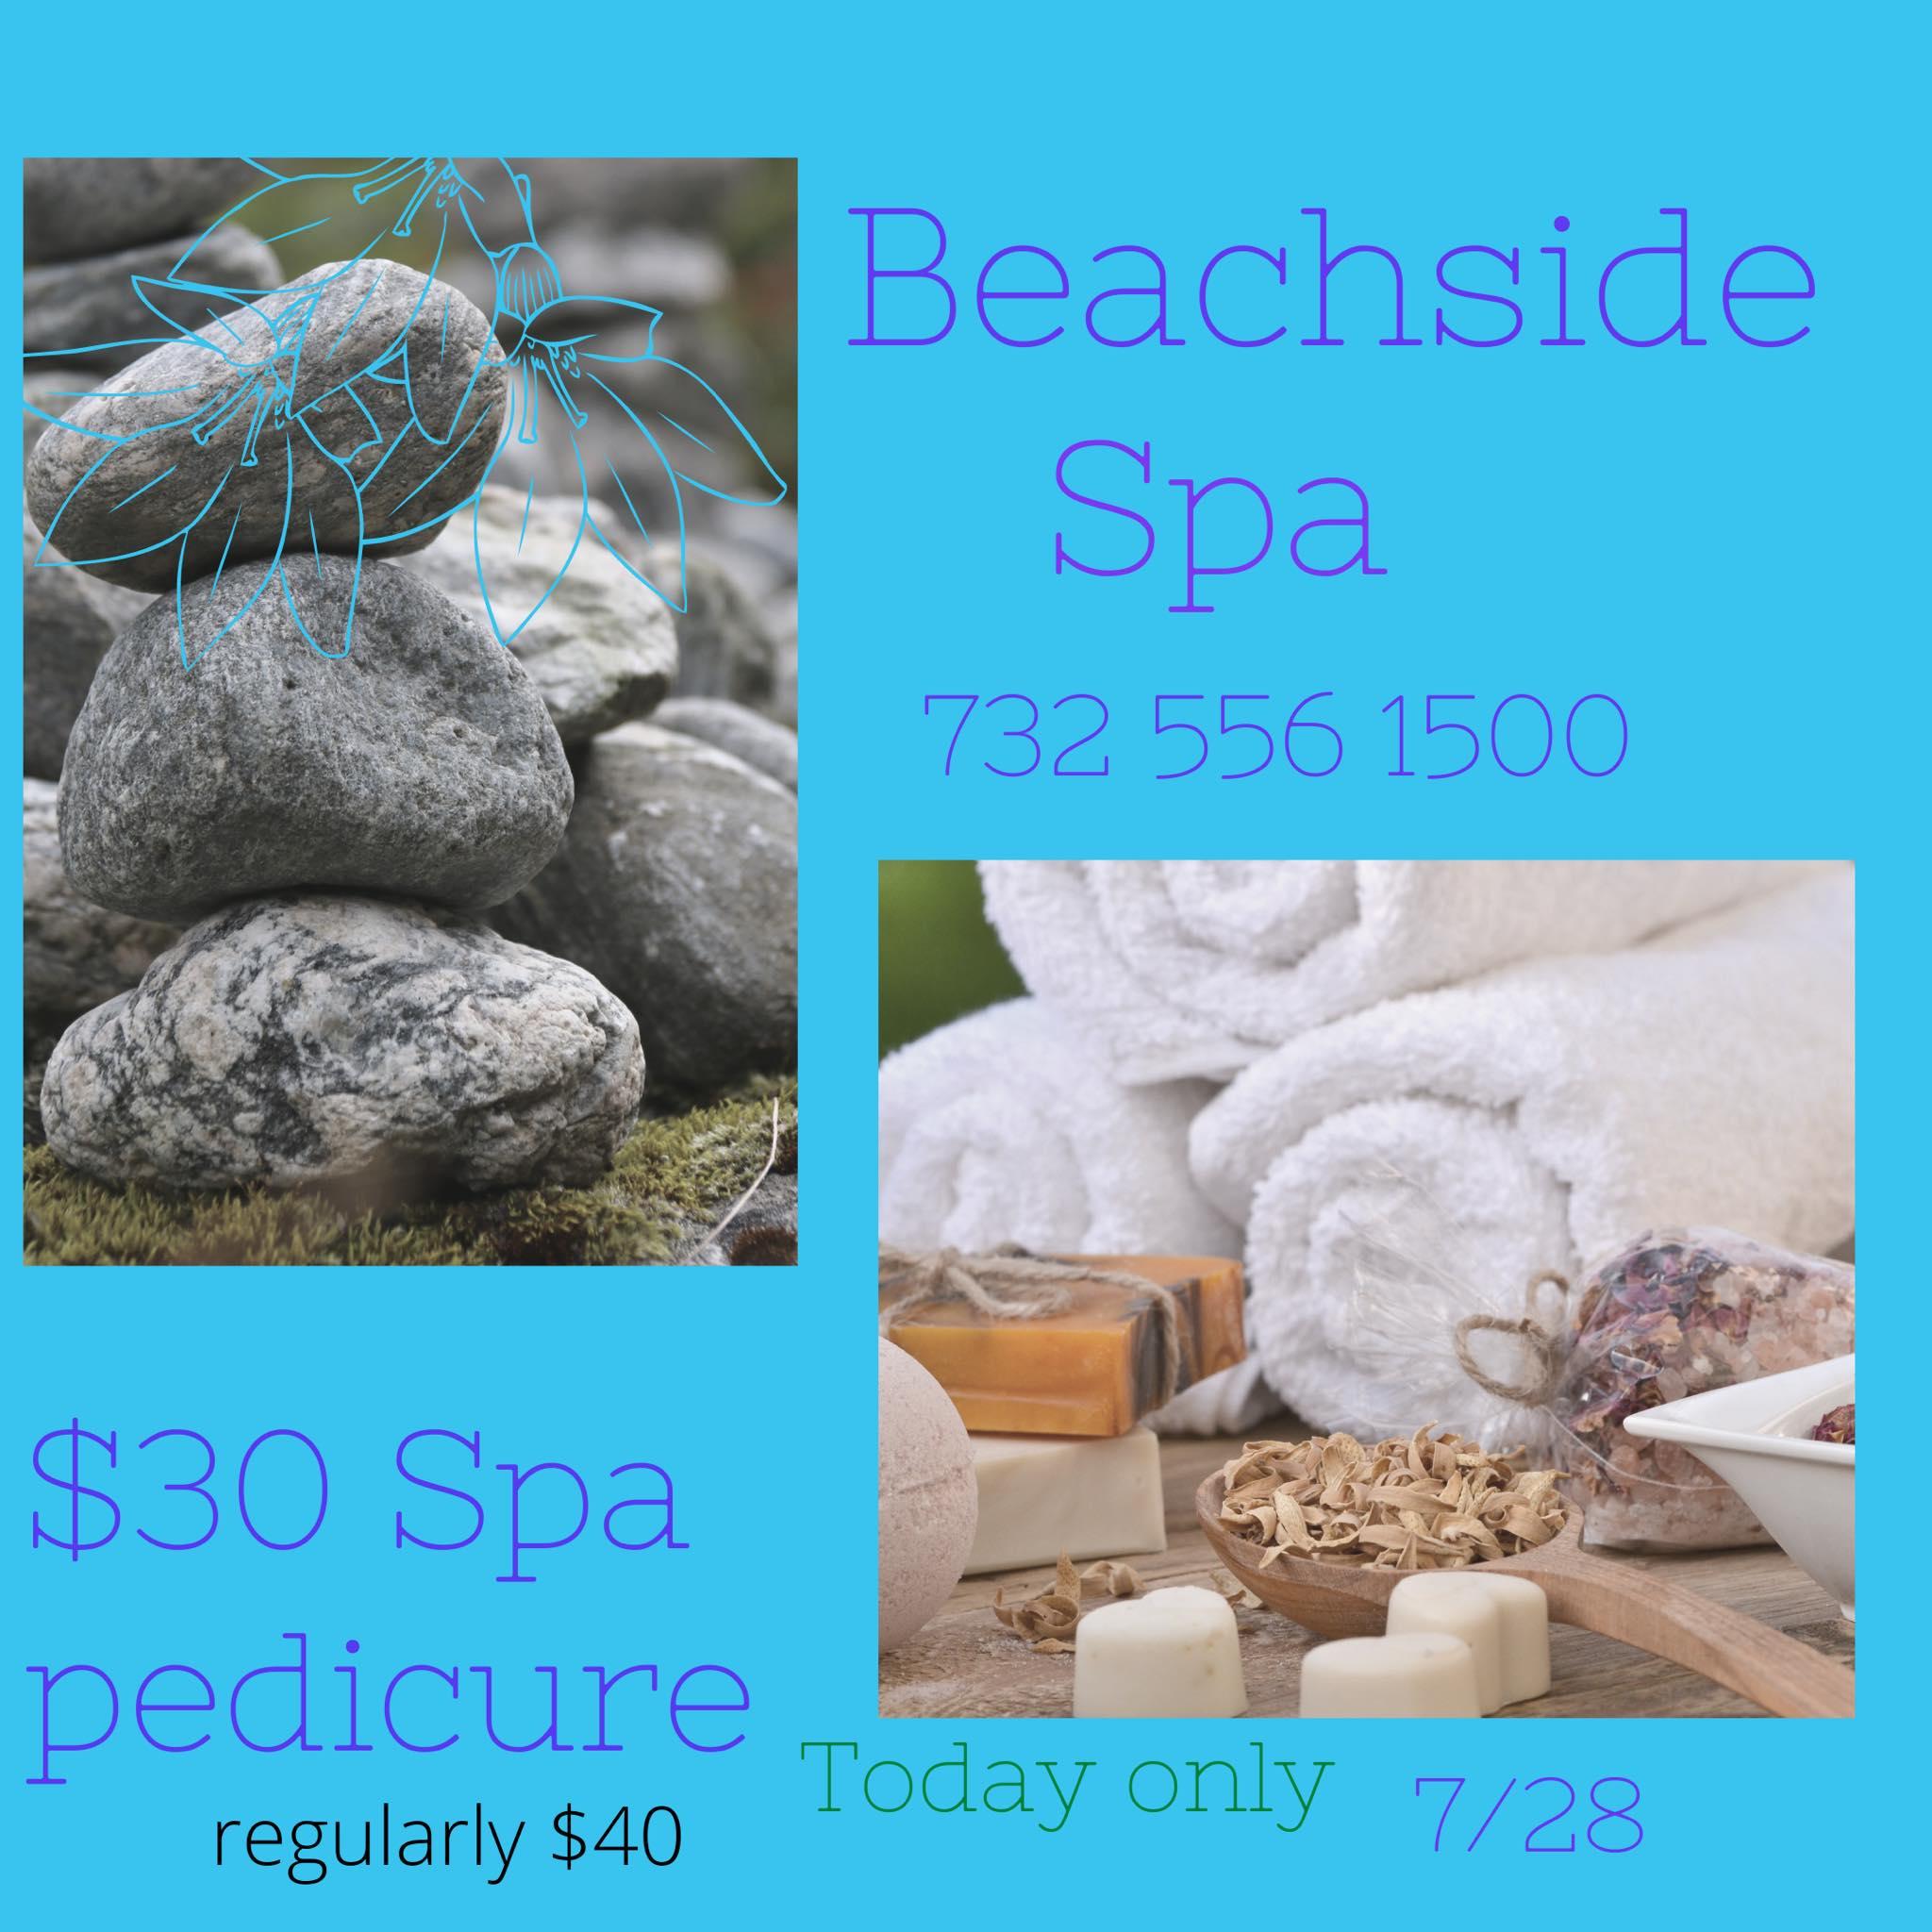 Beachside Spa